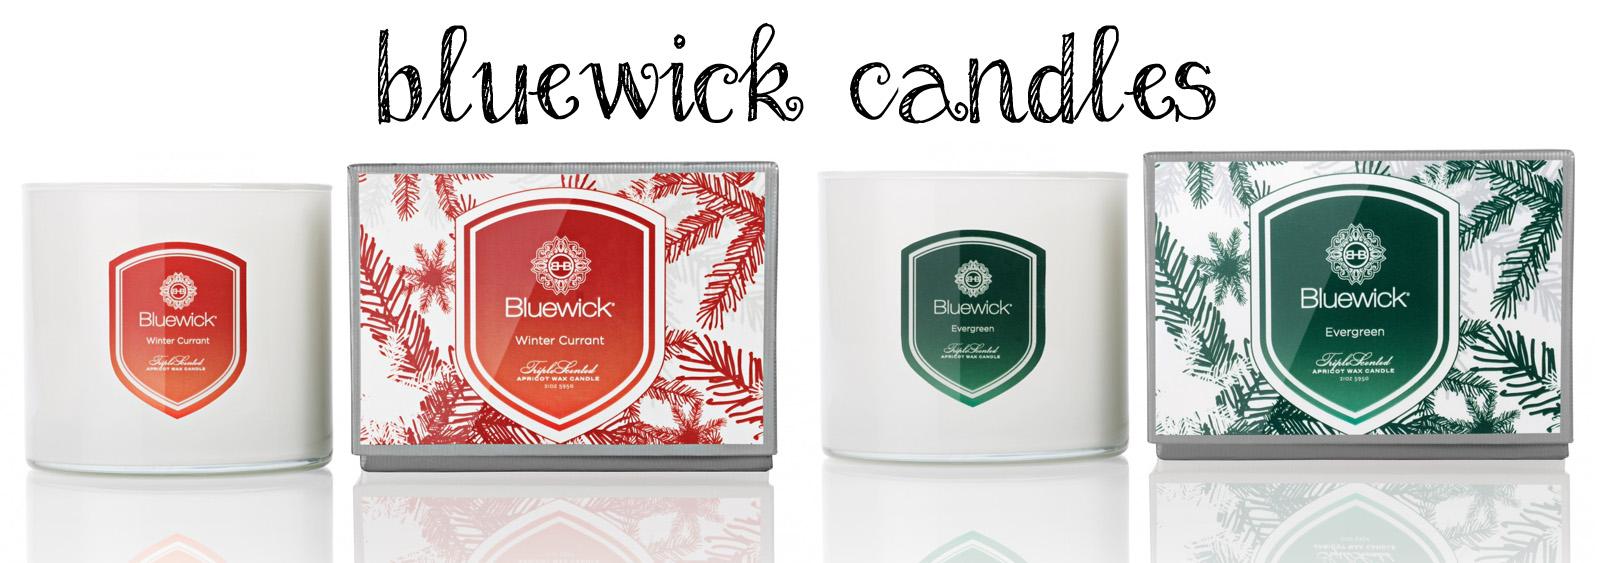 Bluewick triple wick candles (2)